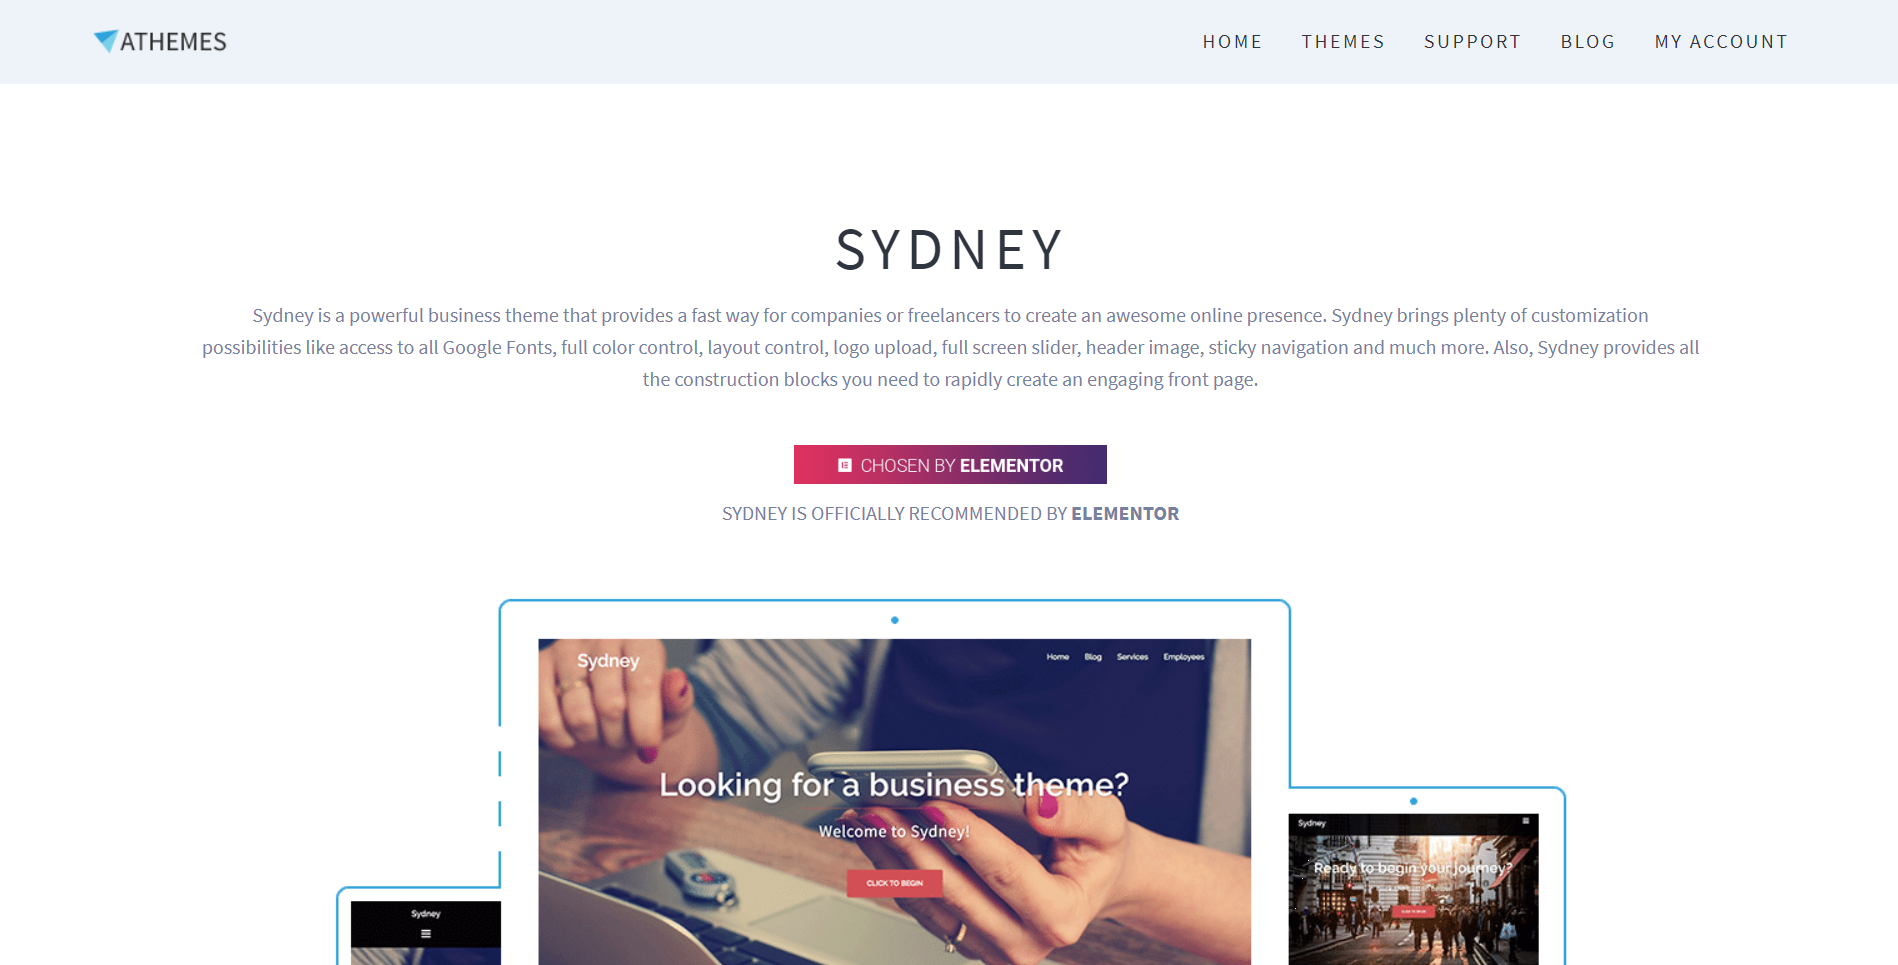 Sydney site image